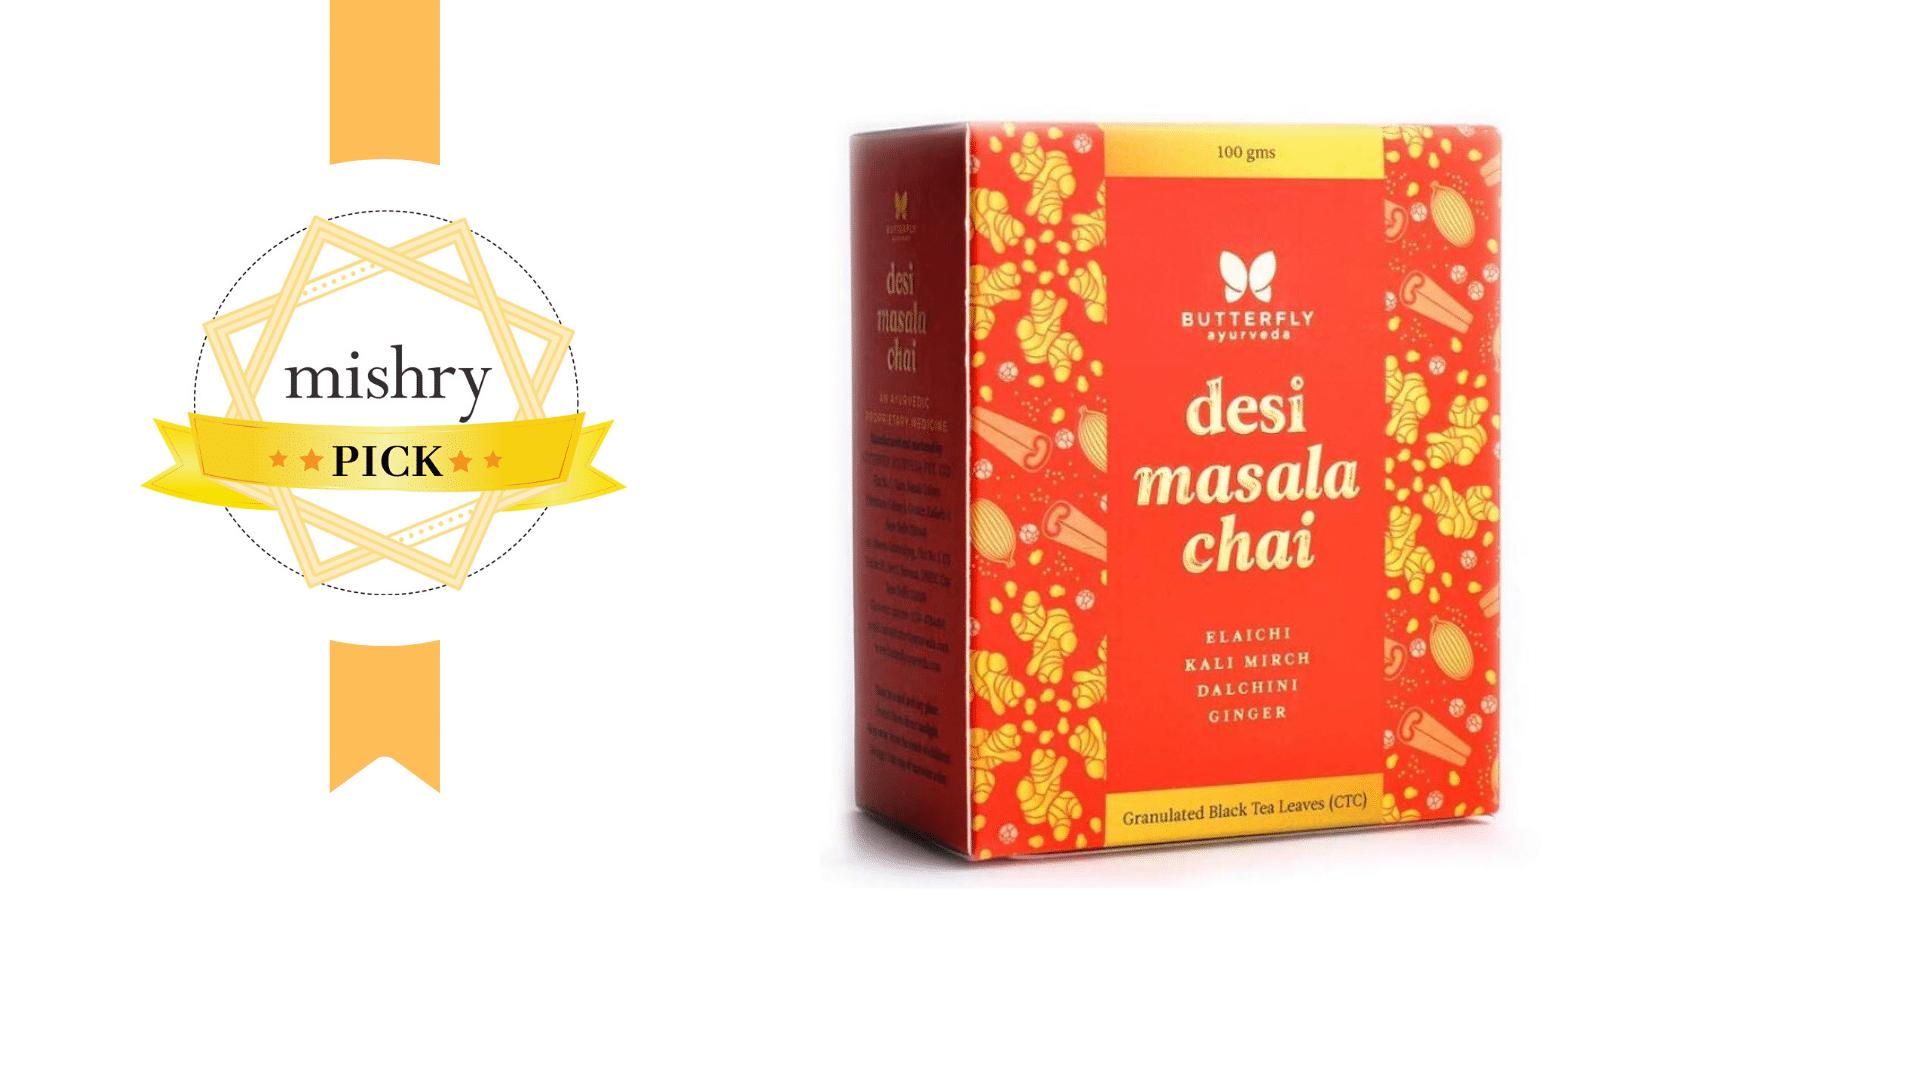 Butterfly Ayurveda's Desi Masala Chai-mishry